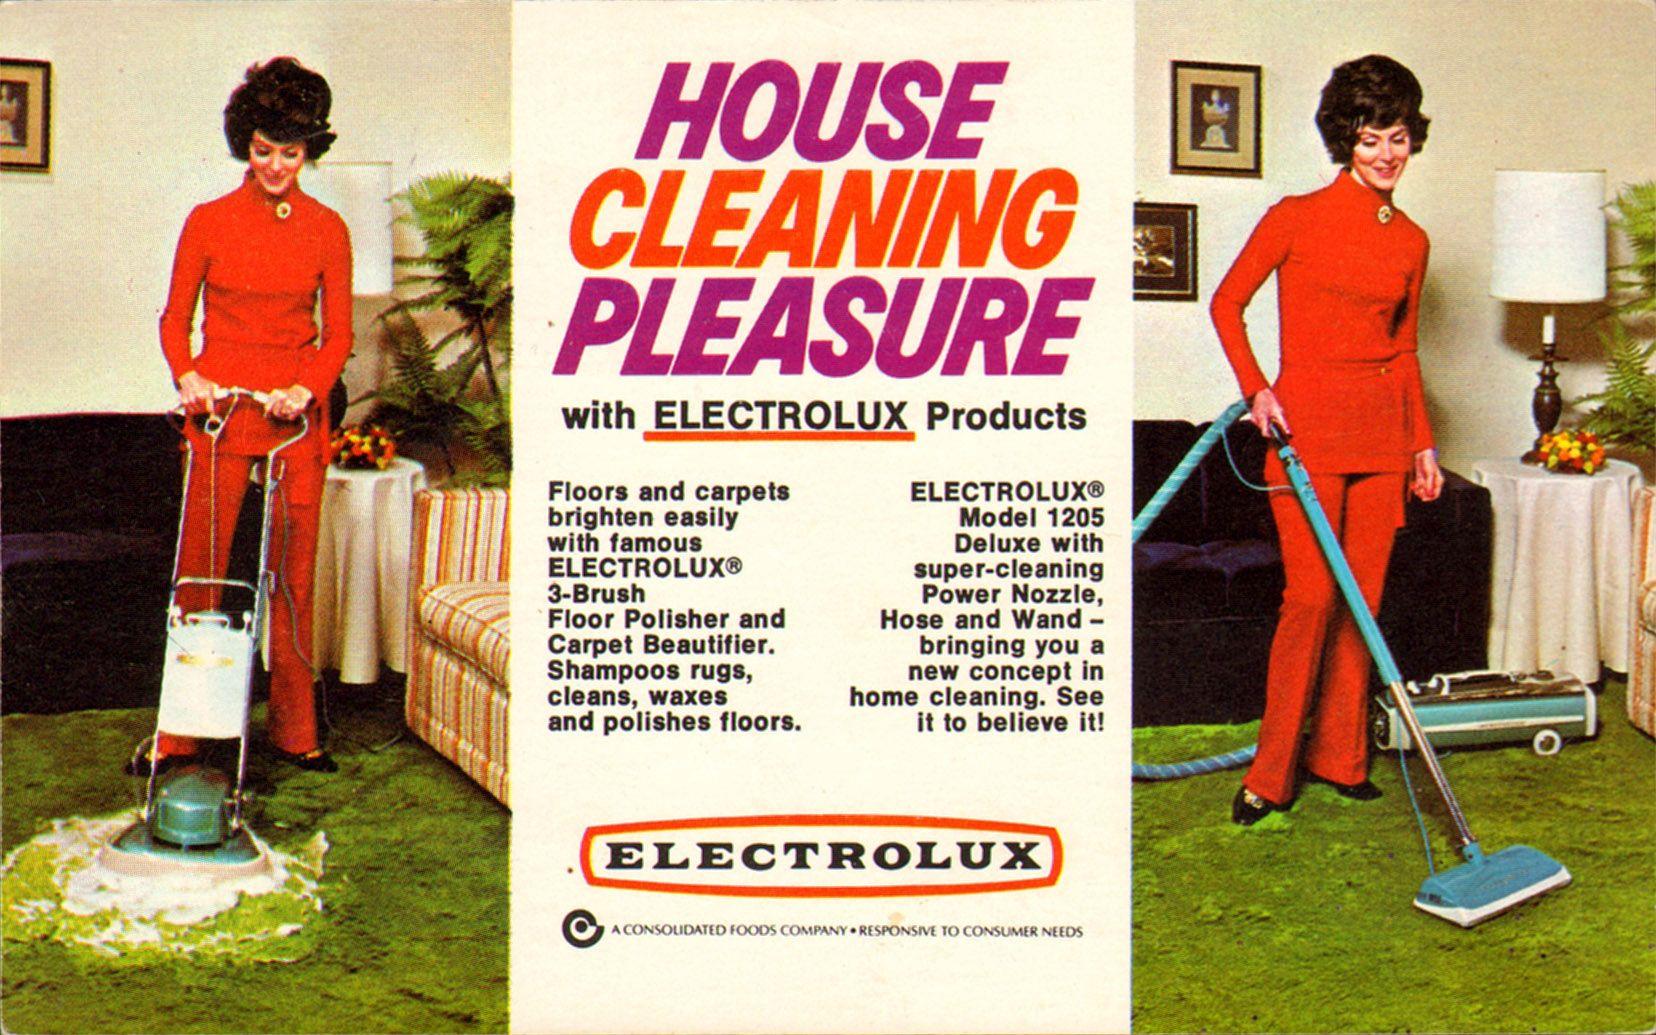 Electrolux Floor And Carpet Cleaners 1970s Postcard Vintageads Ads Vintage Printad Tvads Advertising Brandsci Clean House Electrolux Electrolux Vacuum